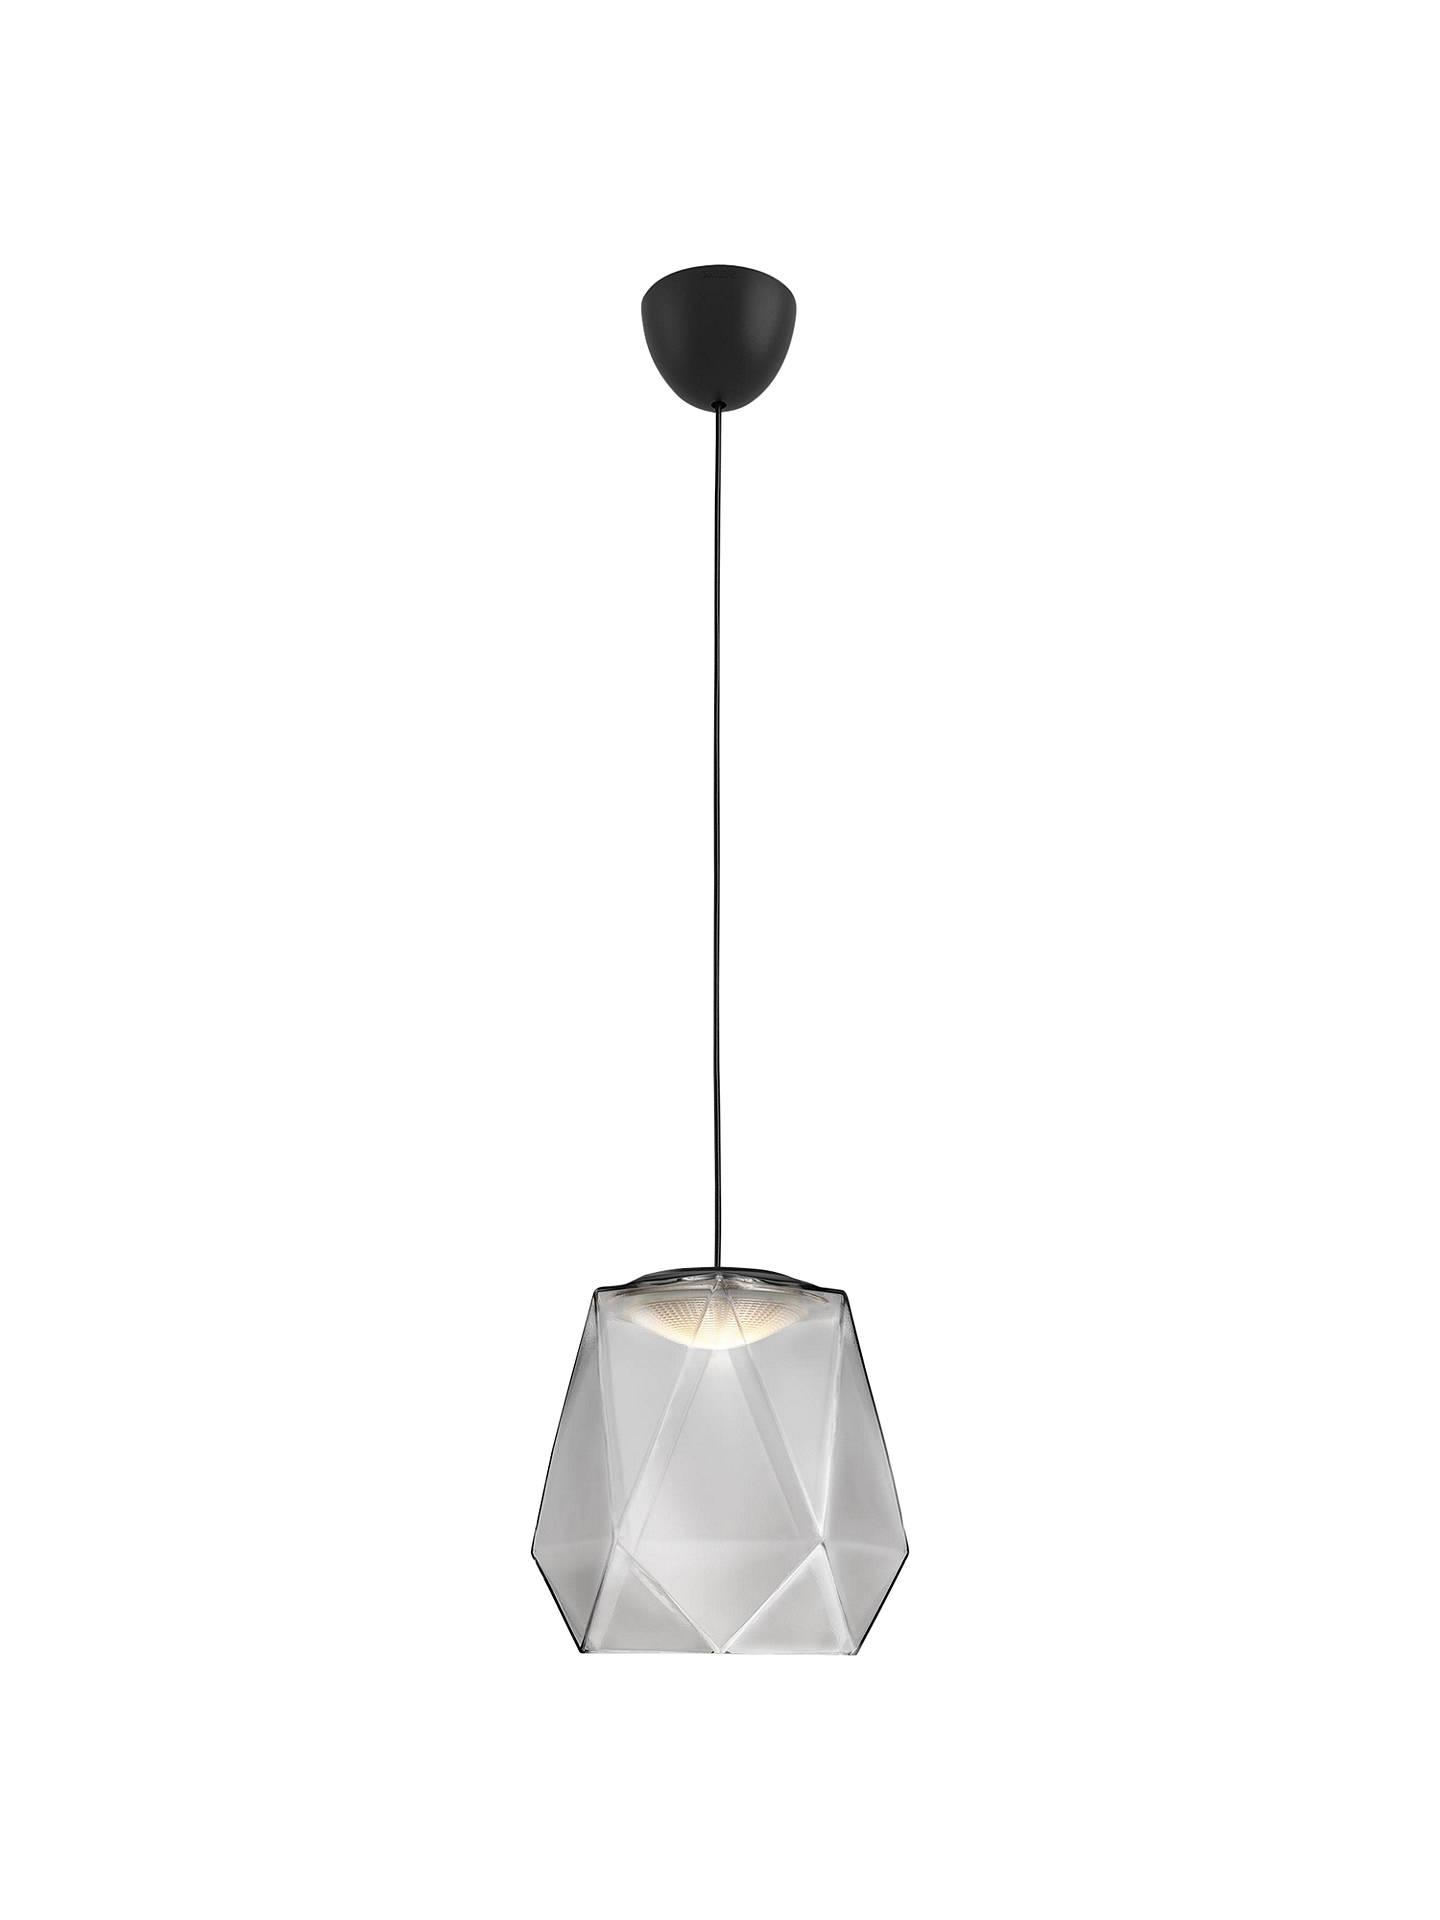 Philips myLiving Italo LED Pendant Light, Grey at John ... on Myliving Outdoors id=84639